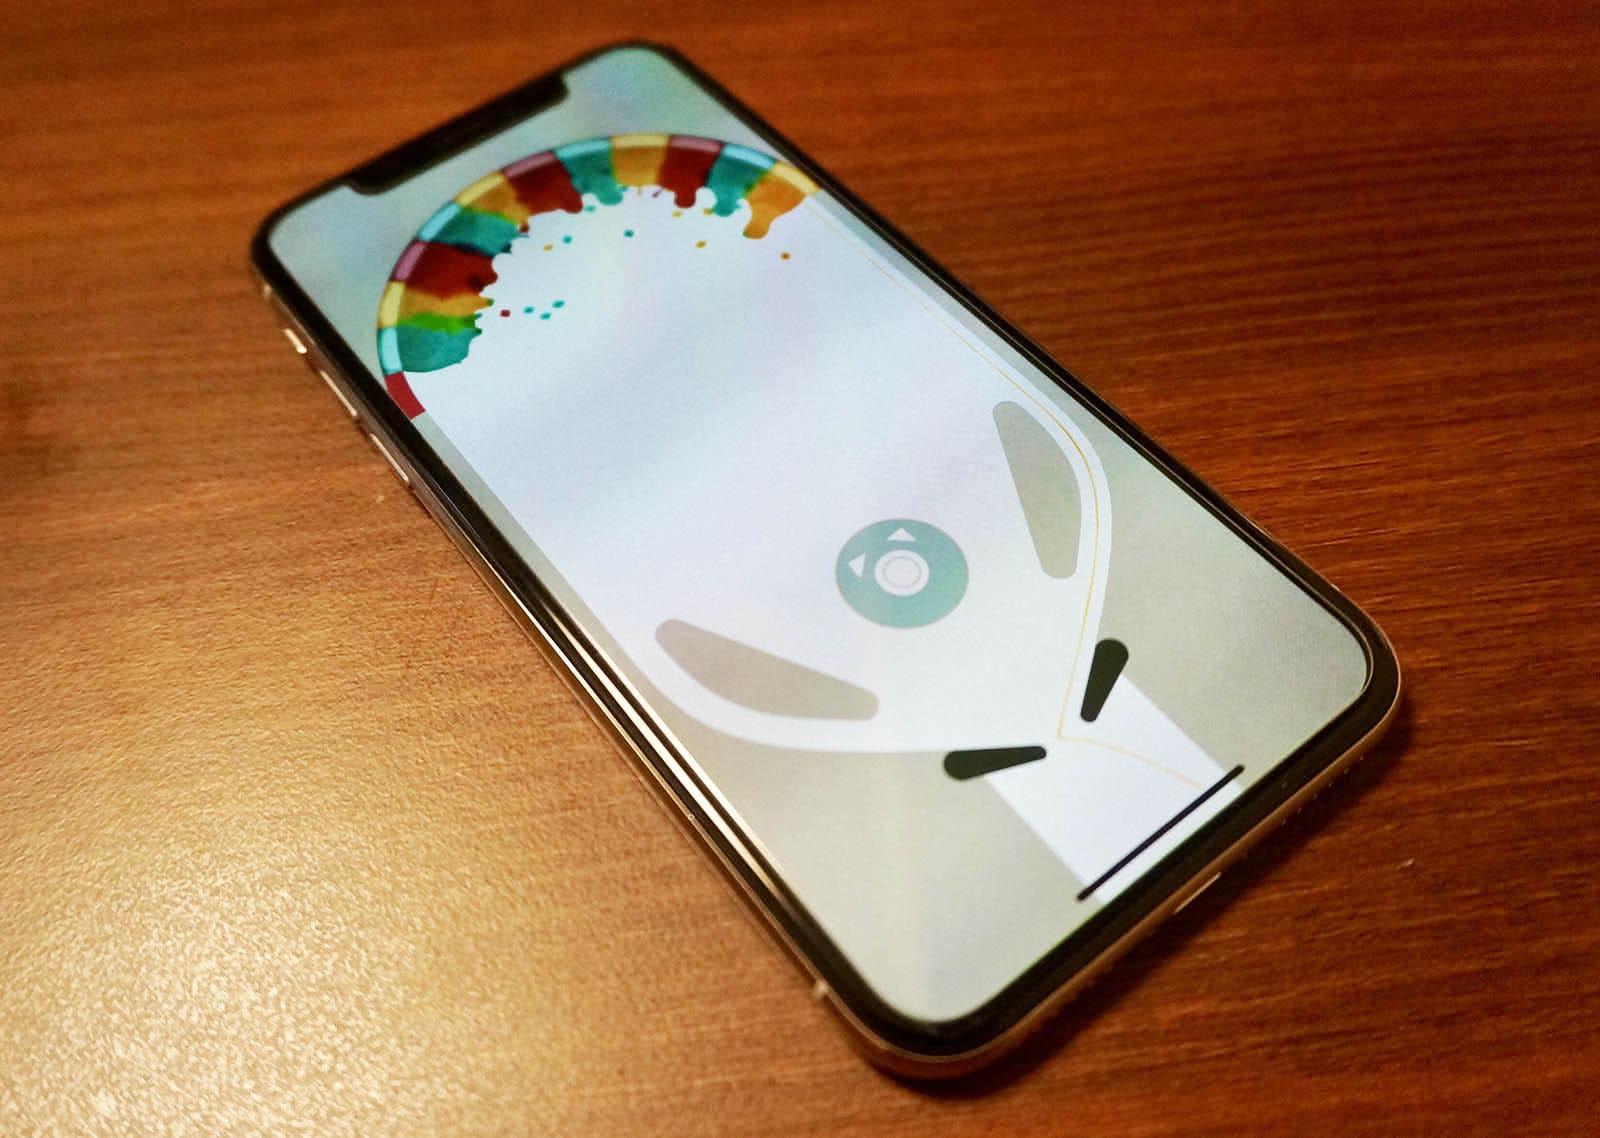 iPhone Xに対応している「Inks」